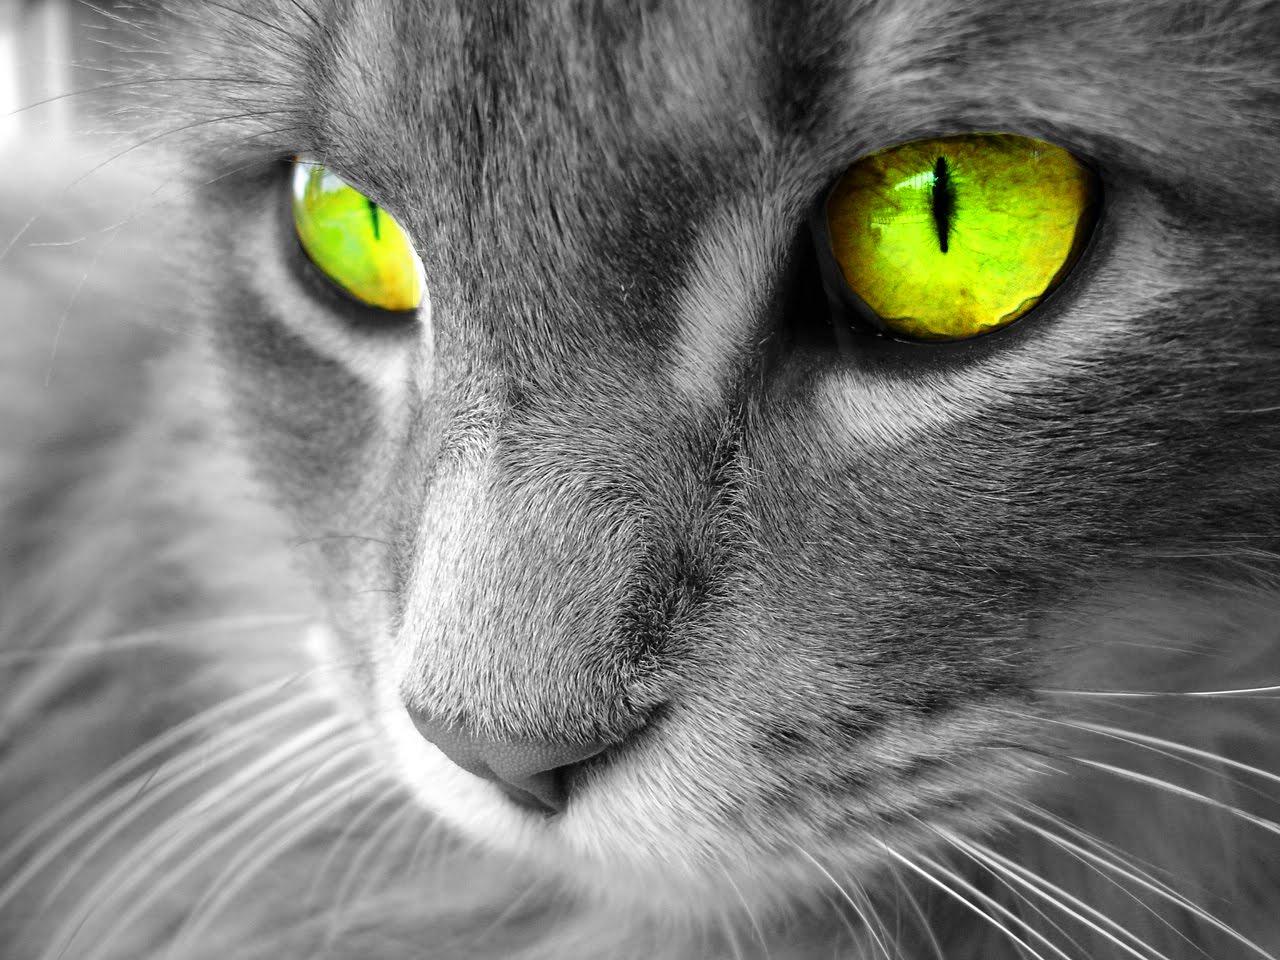 http://3.bp.blogspot.com/-VJUGTs3ROYM/T4LC_JH_2KI/AAAAAAAABn8/kCNvkw7agvs/s1600/gato+ojos+verdes+wallpaper+animales.jpg